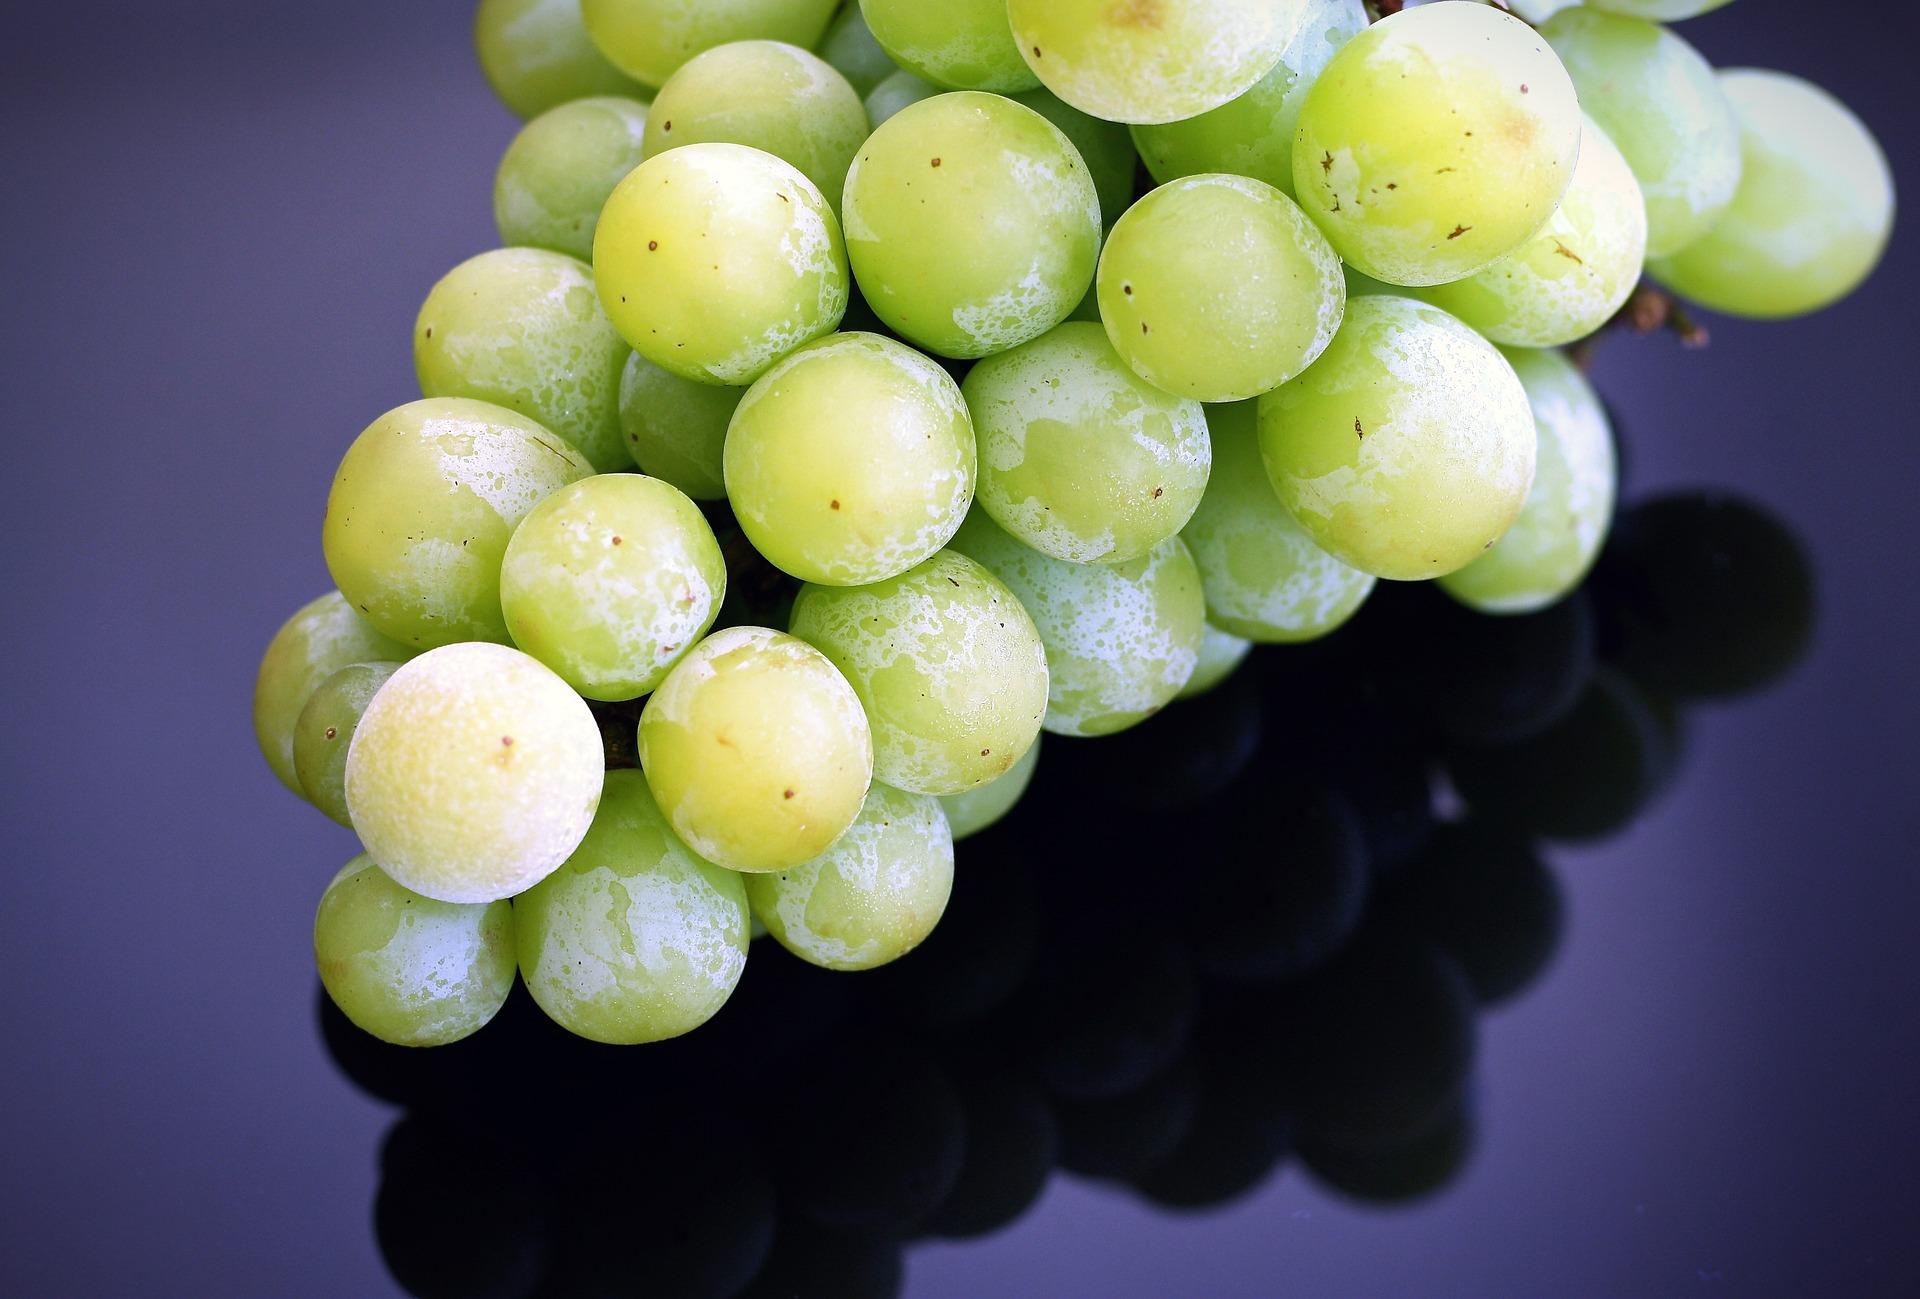 grapes-1476089_1920